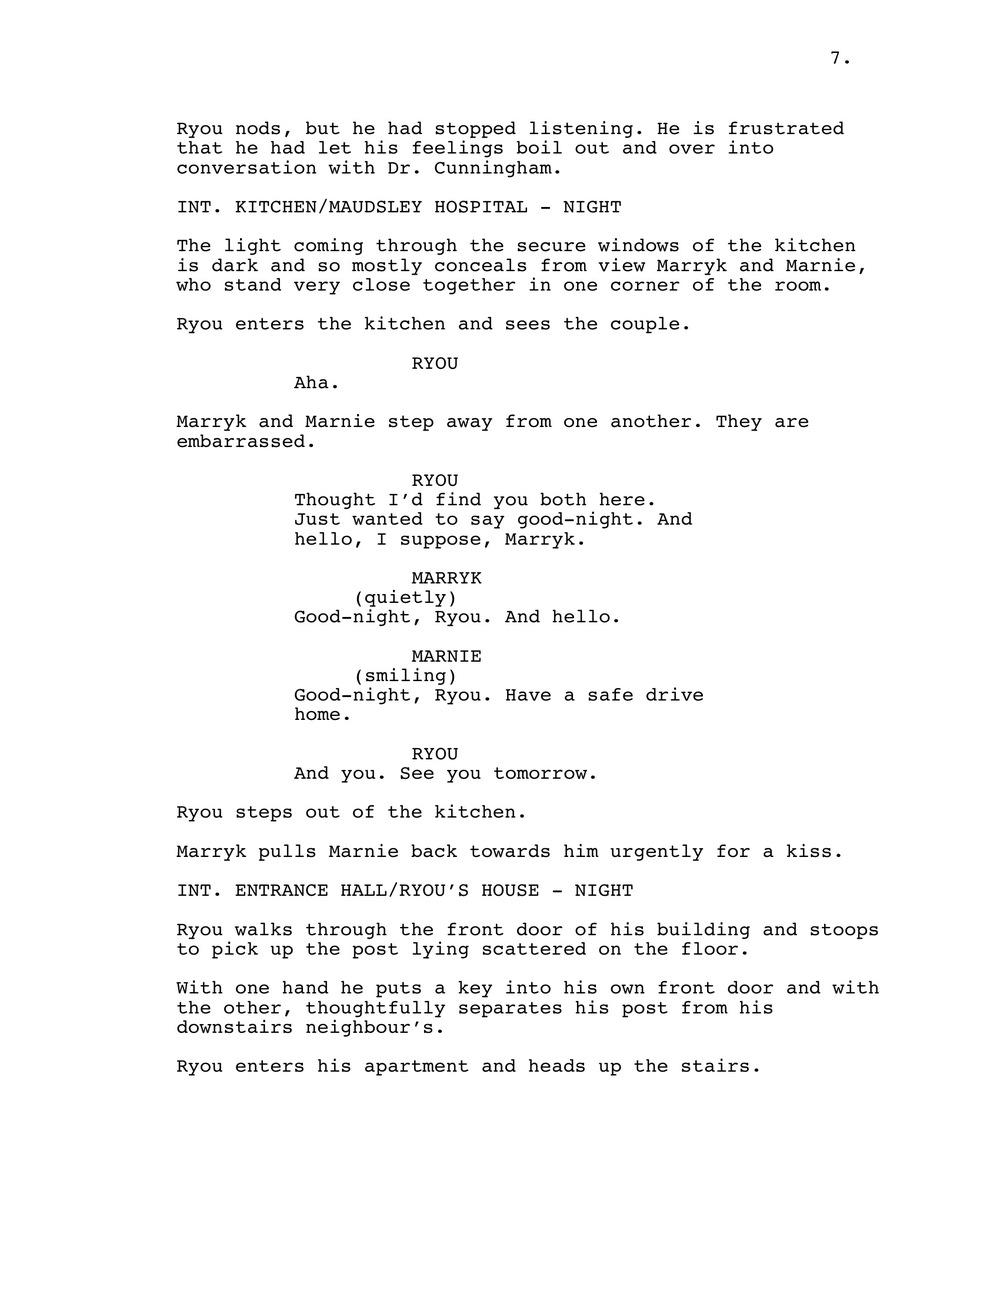 'Introducing Henry Charles' (Pilot) by Alexander Craig | 7.jpeg